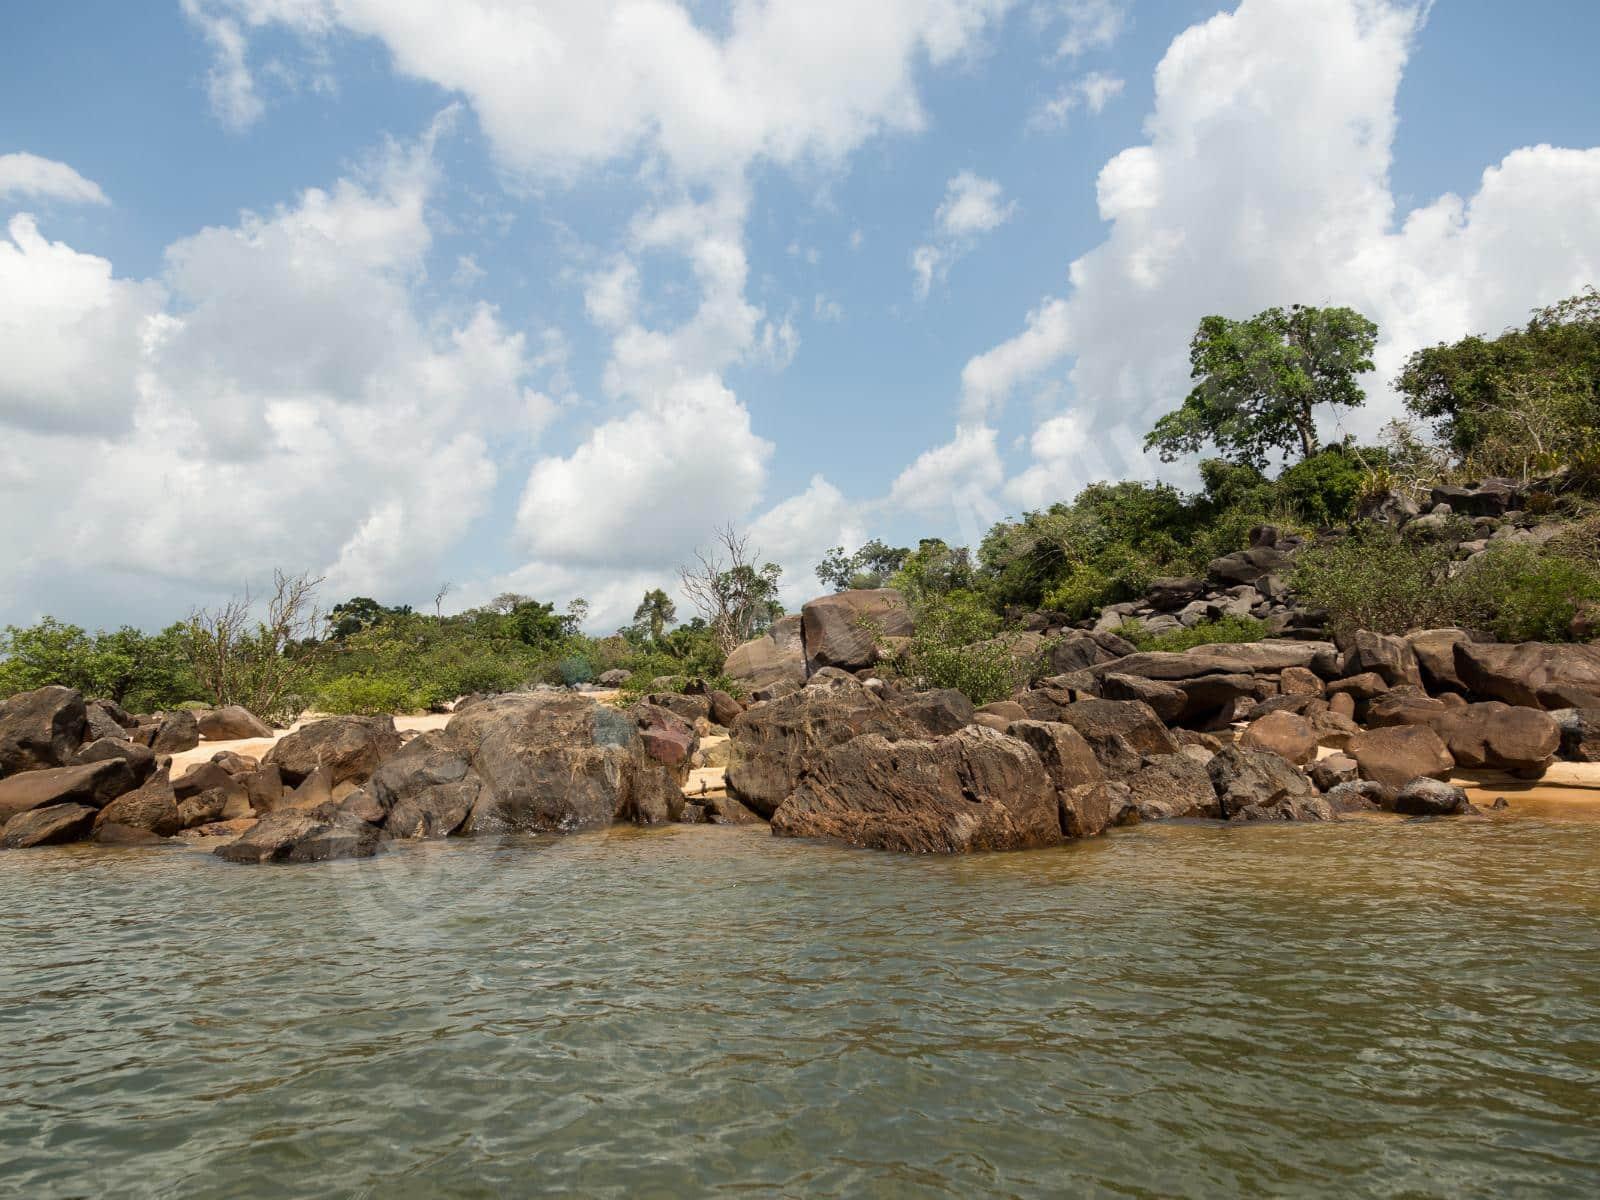 rio xingu  cachoeira do tapaiunas  andreas tanke 0057 7